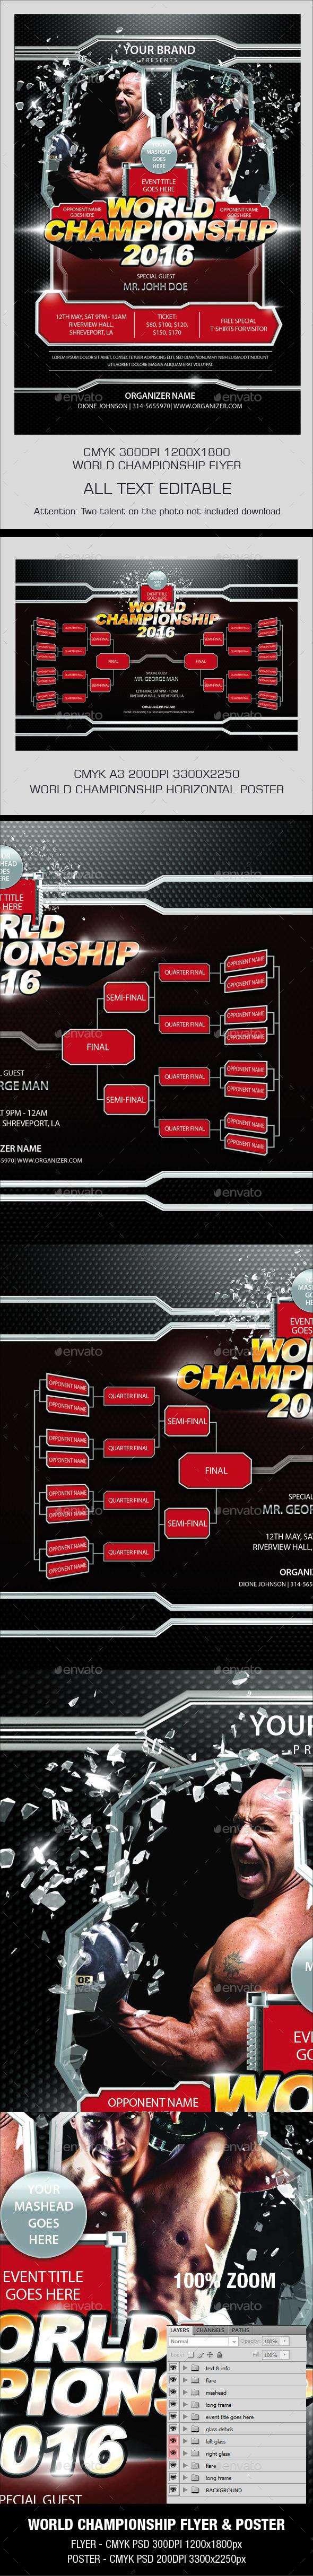 World Championship Flyer - Sports Events